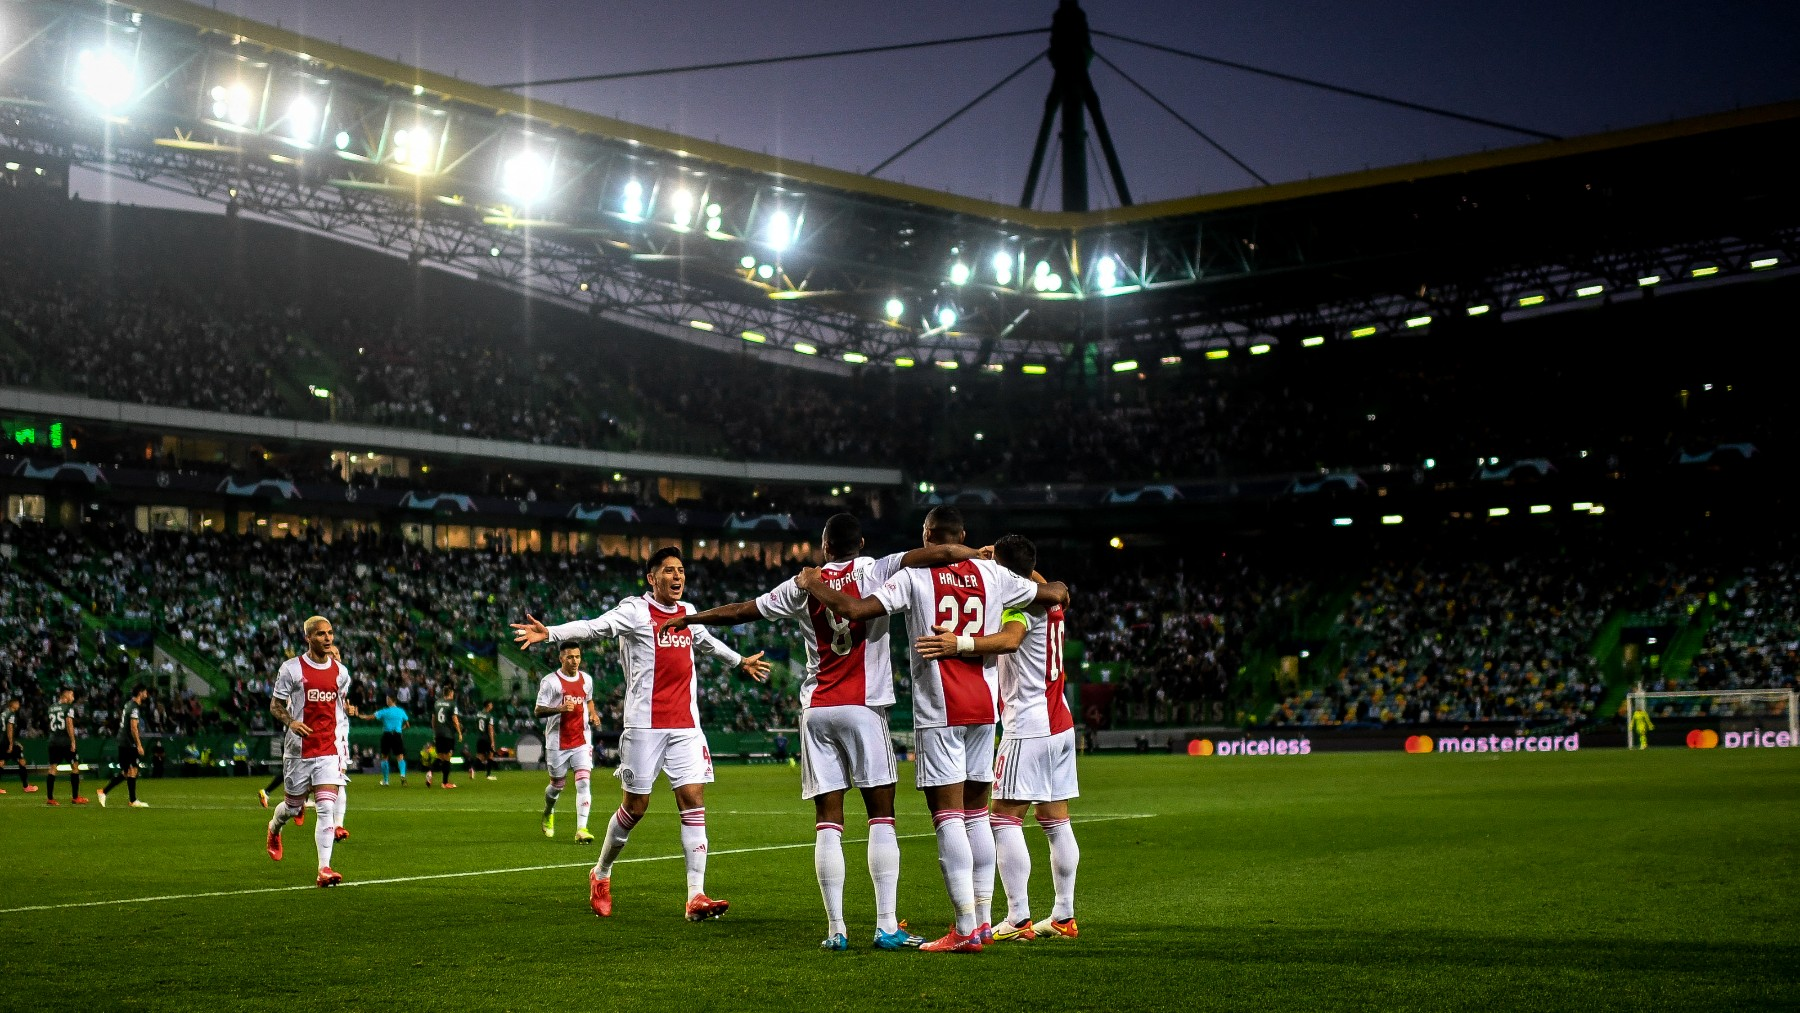 El Ajax celebra un gol contra el Sporting de Portugal. (AFP)